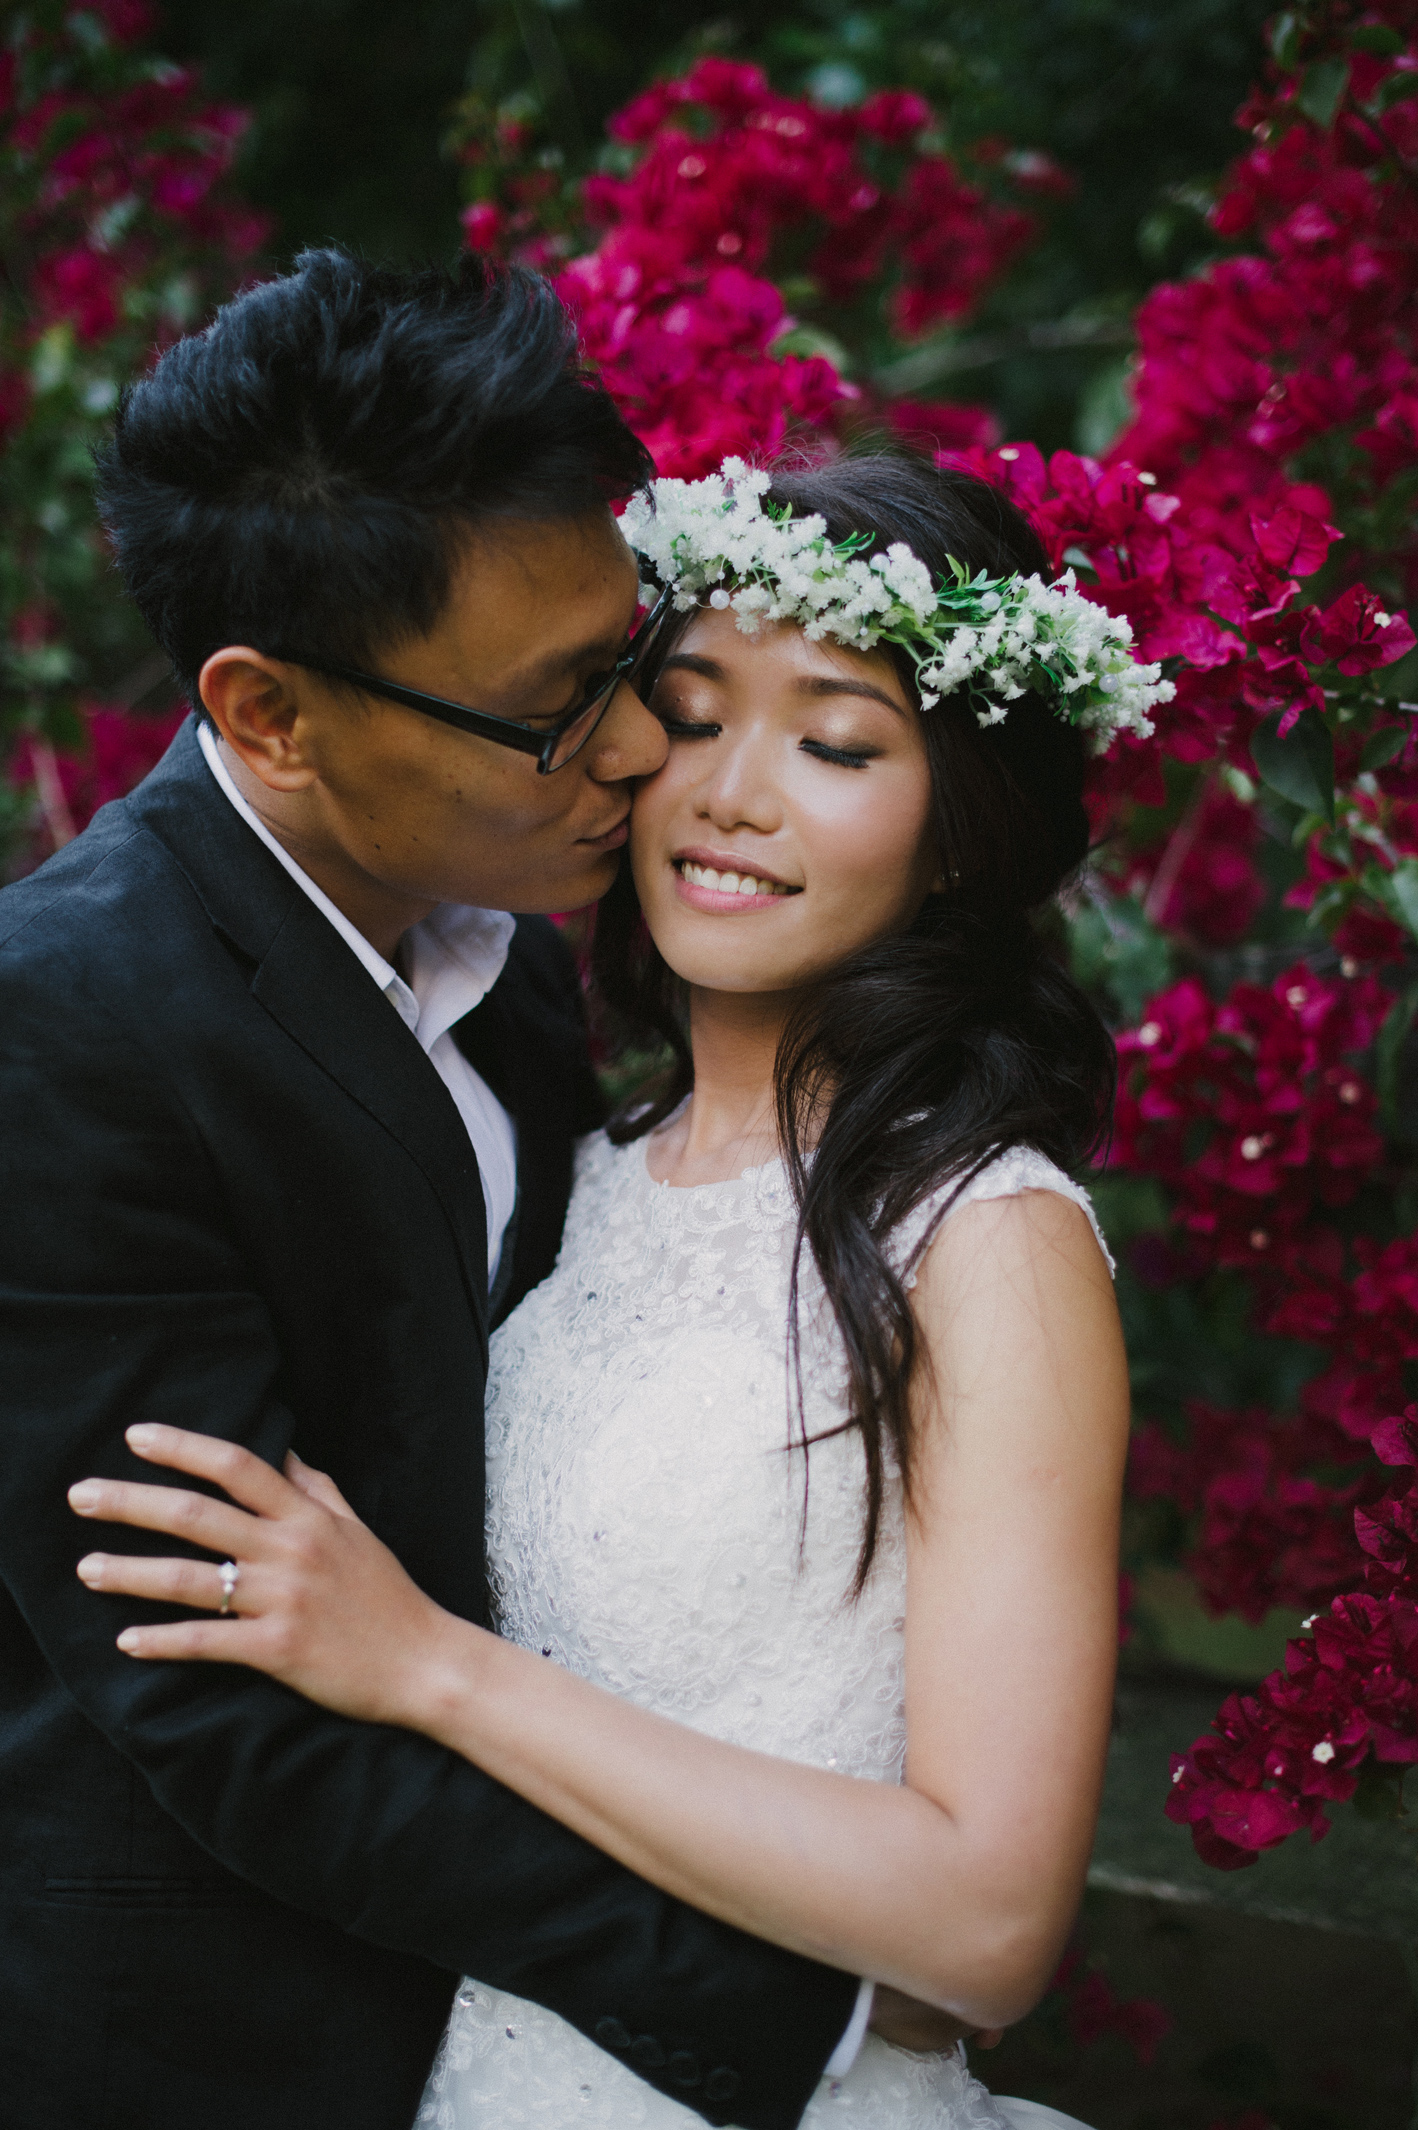 018-ed-janet-currumbin-wedding_sophie-baker-photography